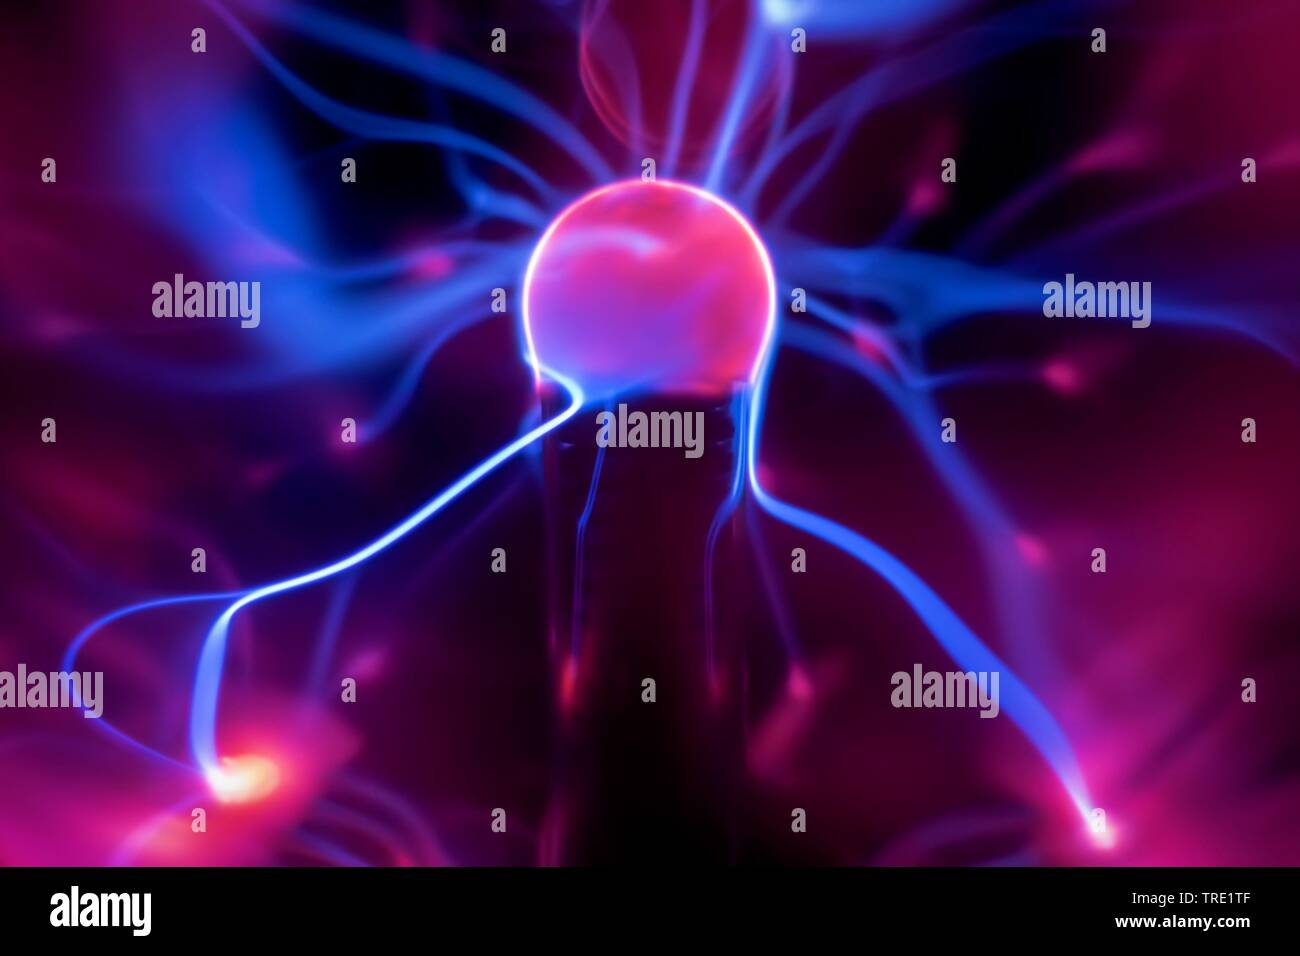 Plasmalampe mit elektrischer Entladung   plasma lamp with moving light beams   BLWS514904.jpg [ (c) blickwinkel/McPHOTO/M. Gann Tel. +49 (0)2302-27932 - Stock Image